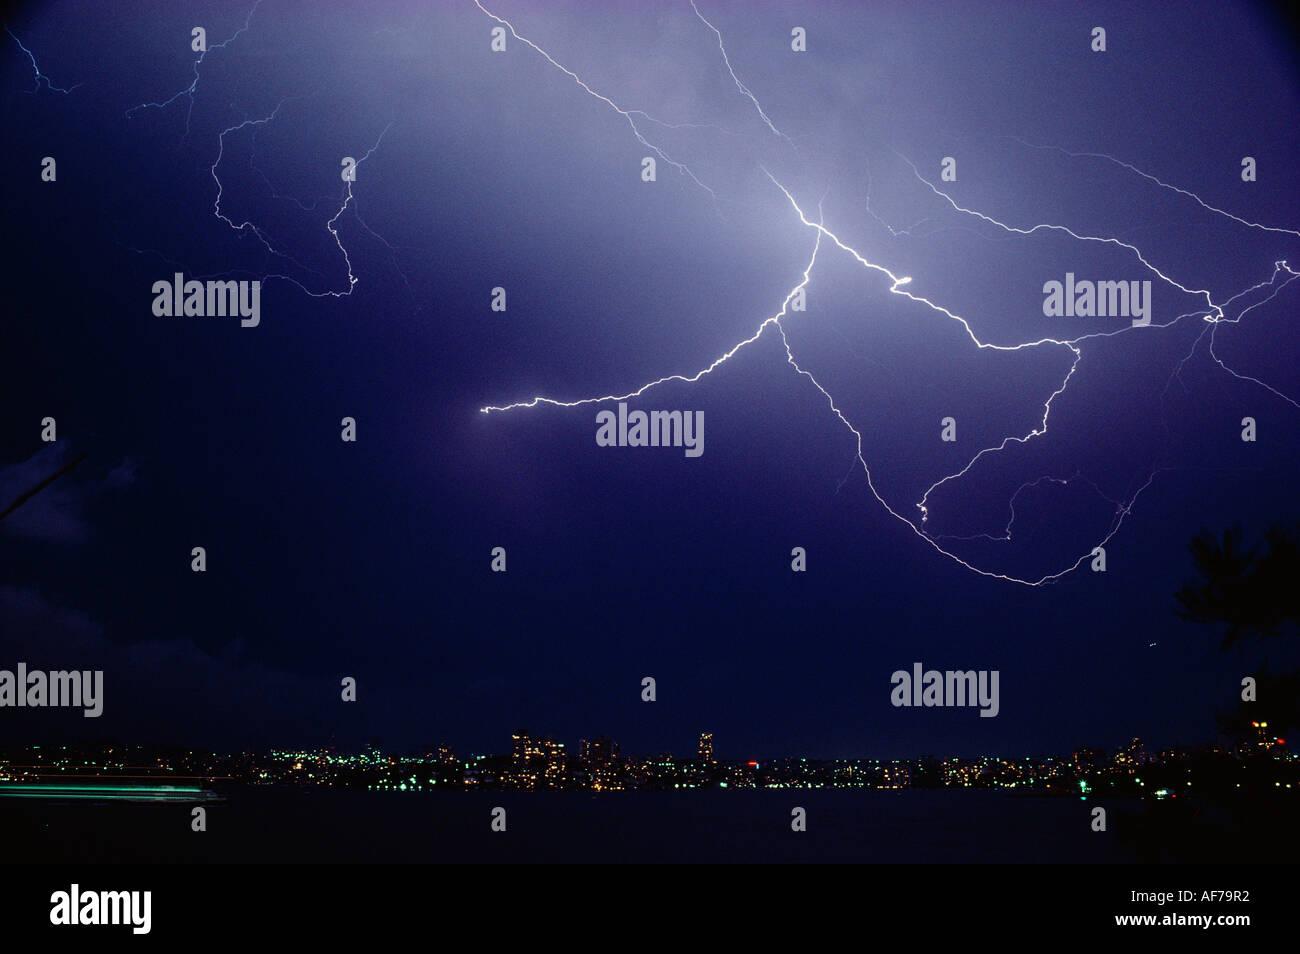 Sheet lightning over Sydney city suburb waterfront at night. - Stock Image